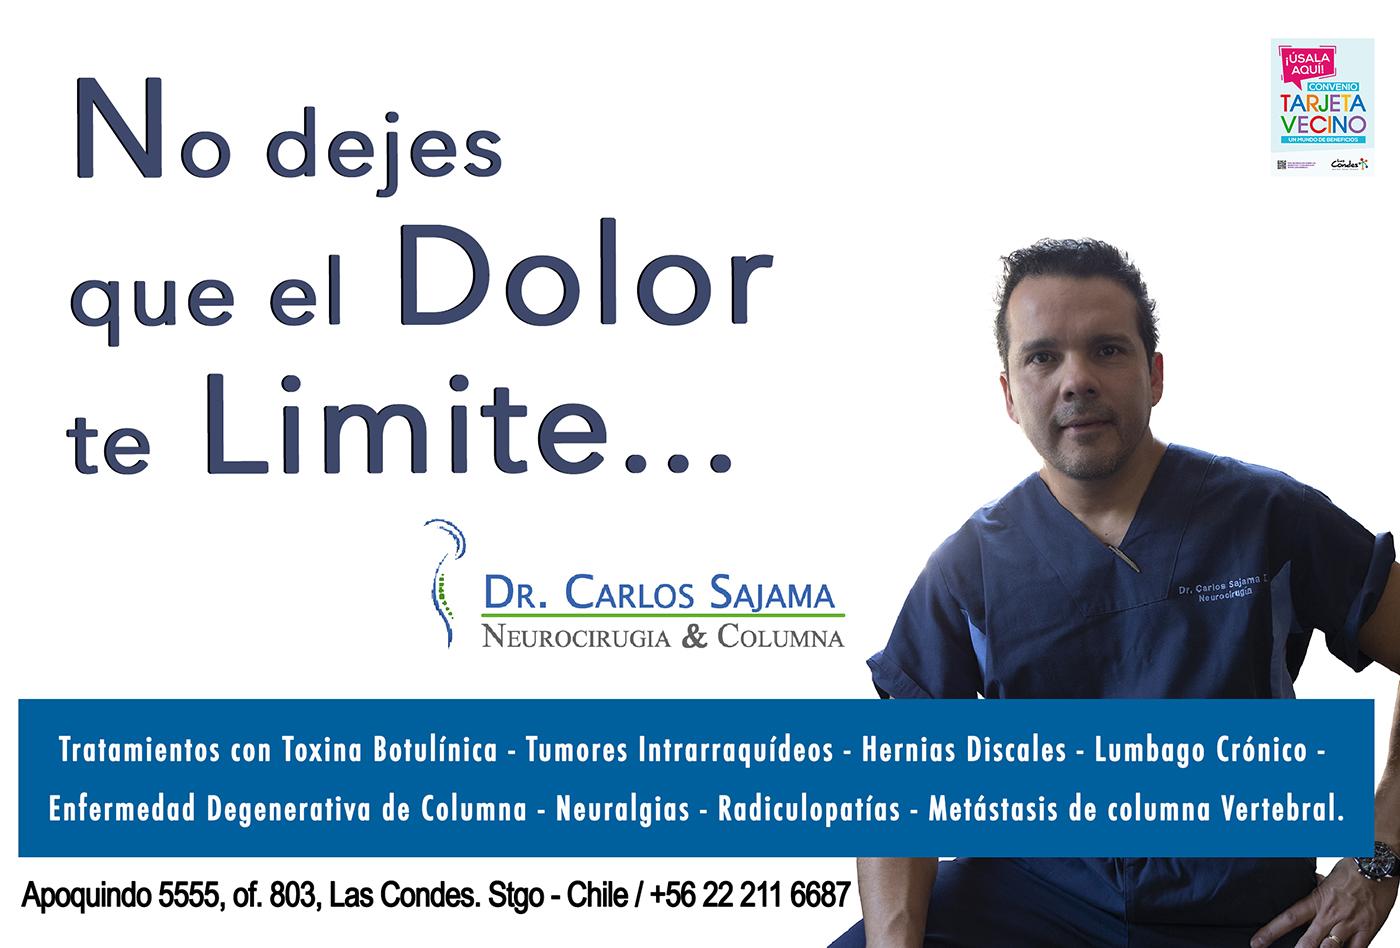 DR. CARLOS SAJAMA PROMO